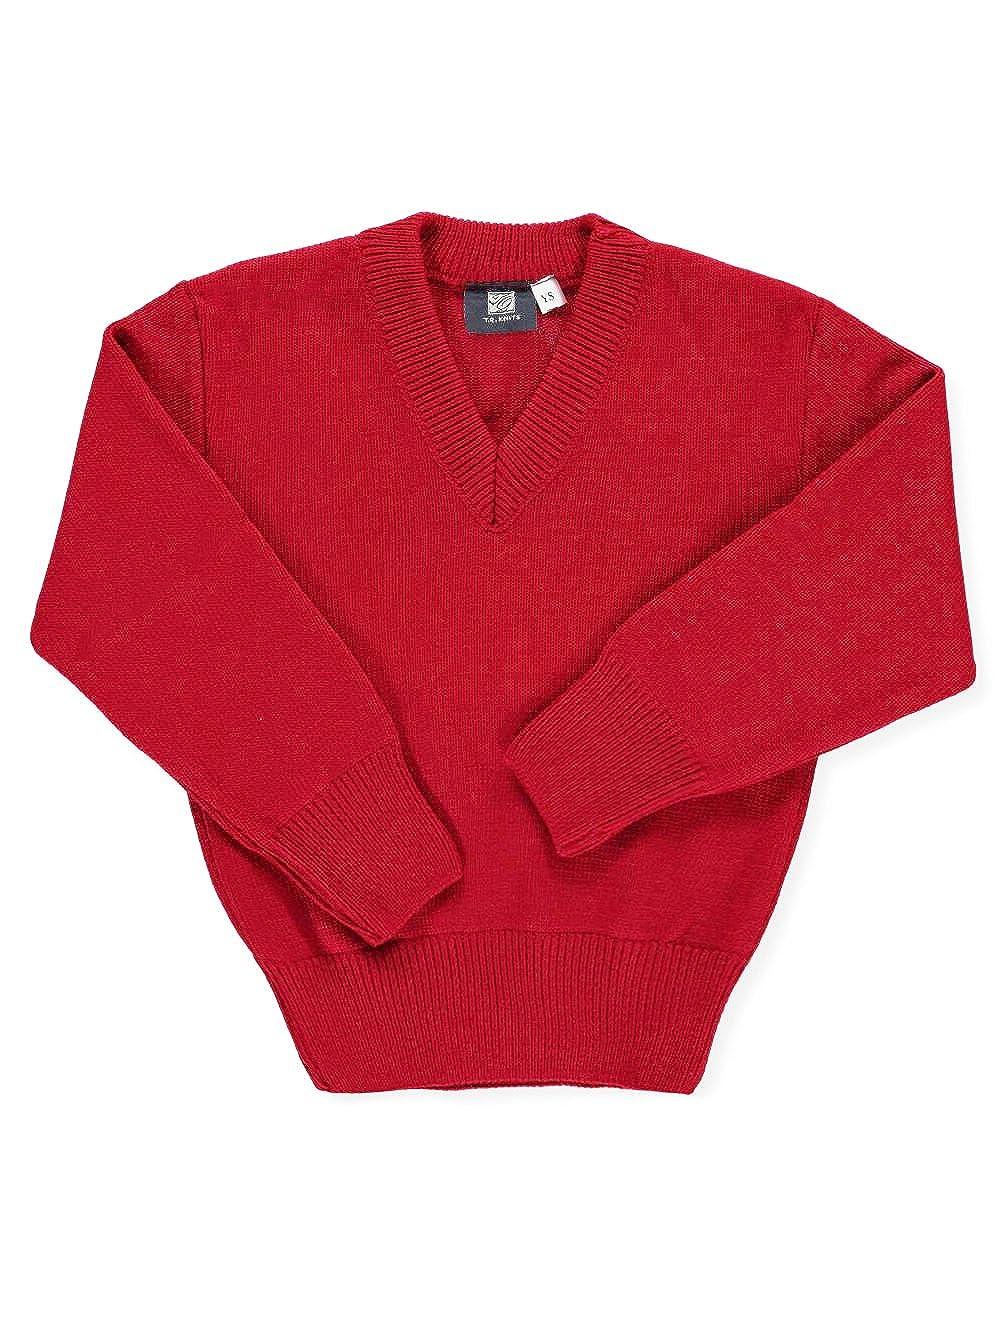 T.Q. Knits Big Boys' Control-Pil V-Neck Sweater